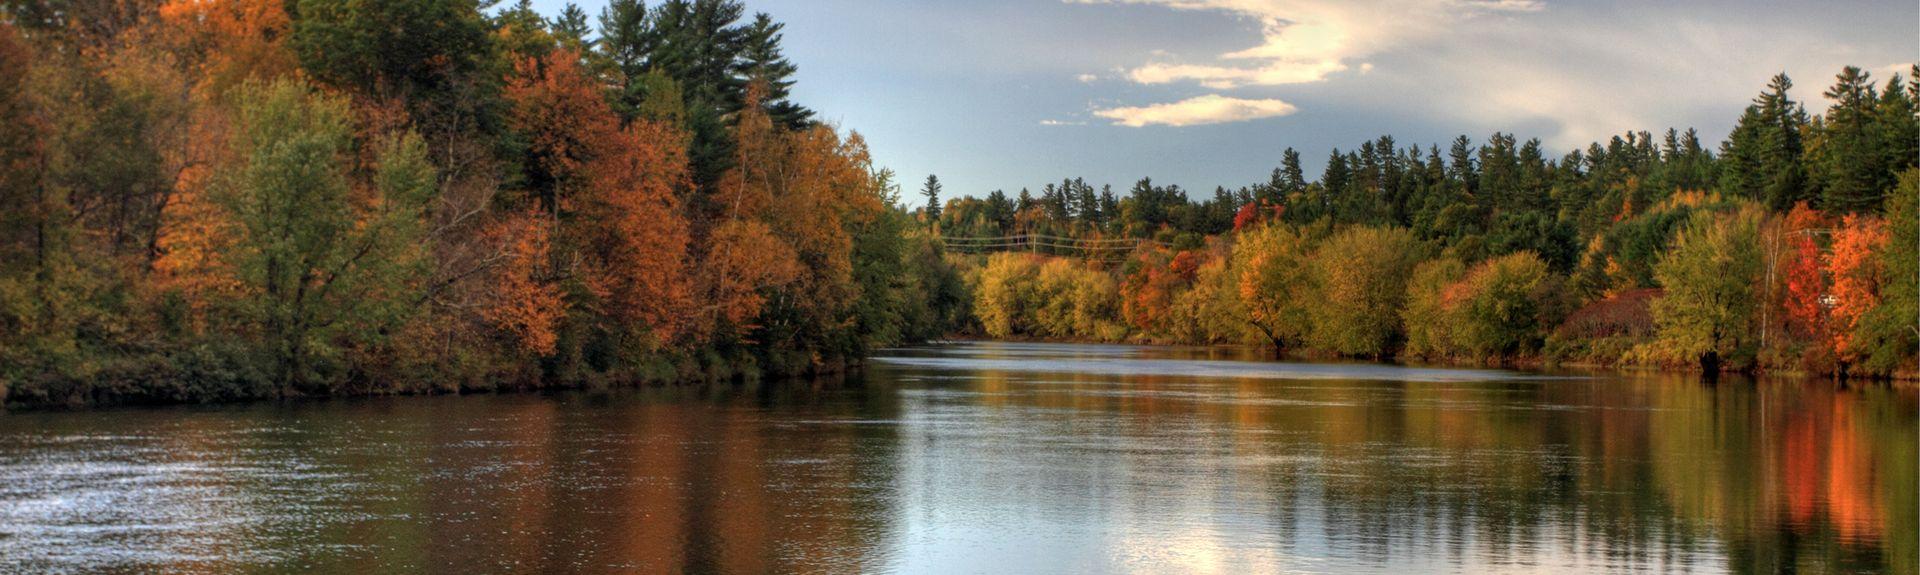 Bethel, Maine, United States of America